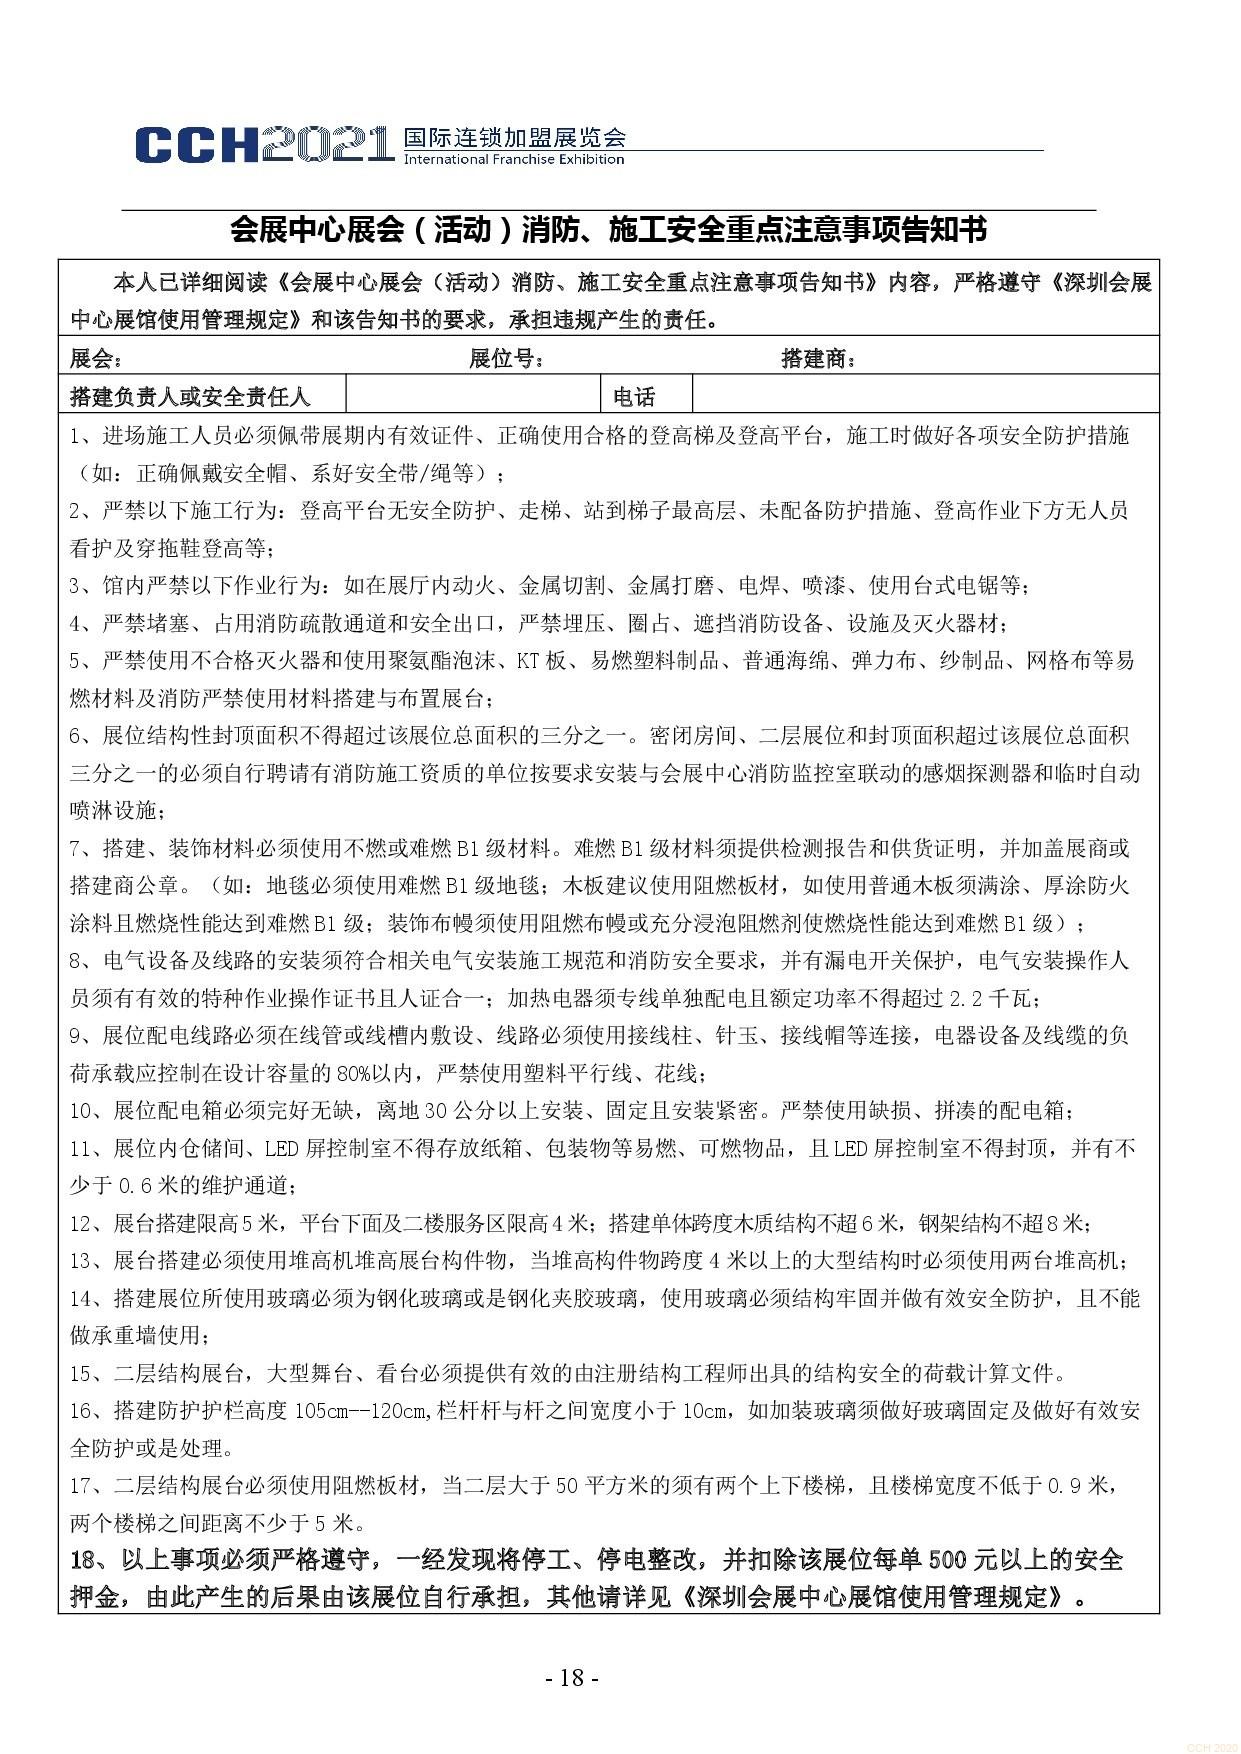 0416CCH深圳展参展商手册4.16-018.jpg